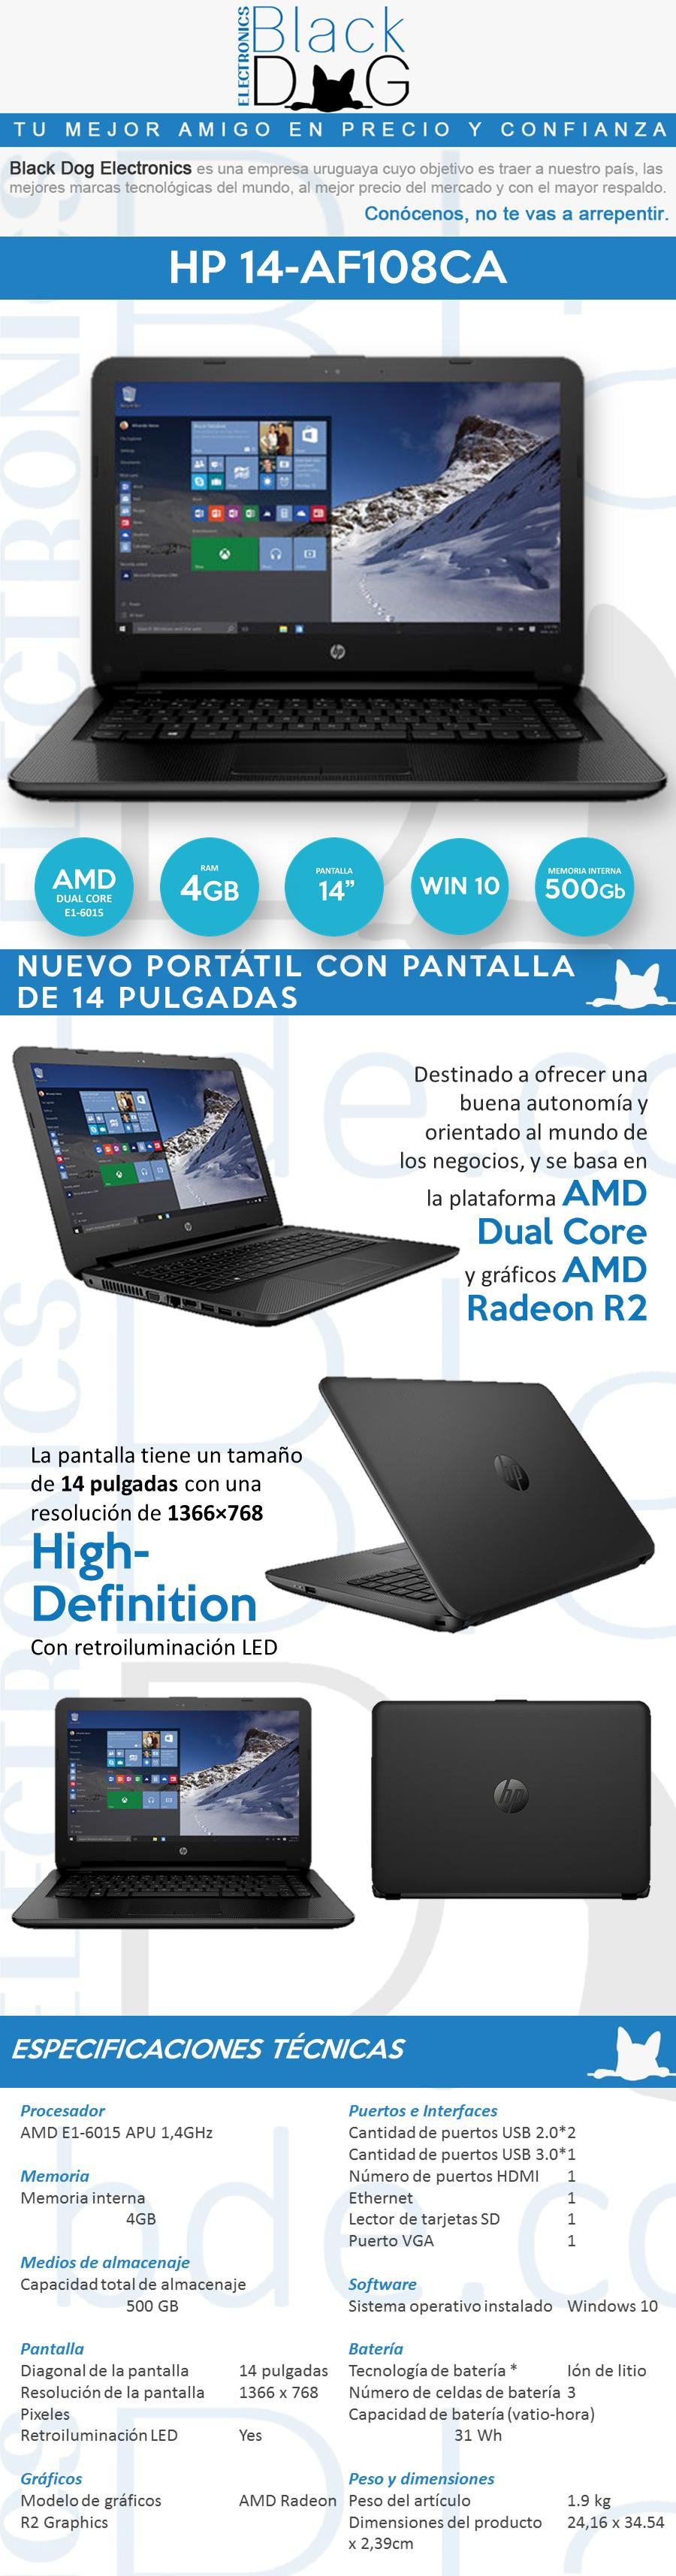 HP 14-AF108CA | Plantillas | Pinterest